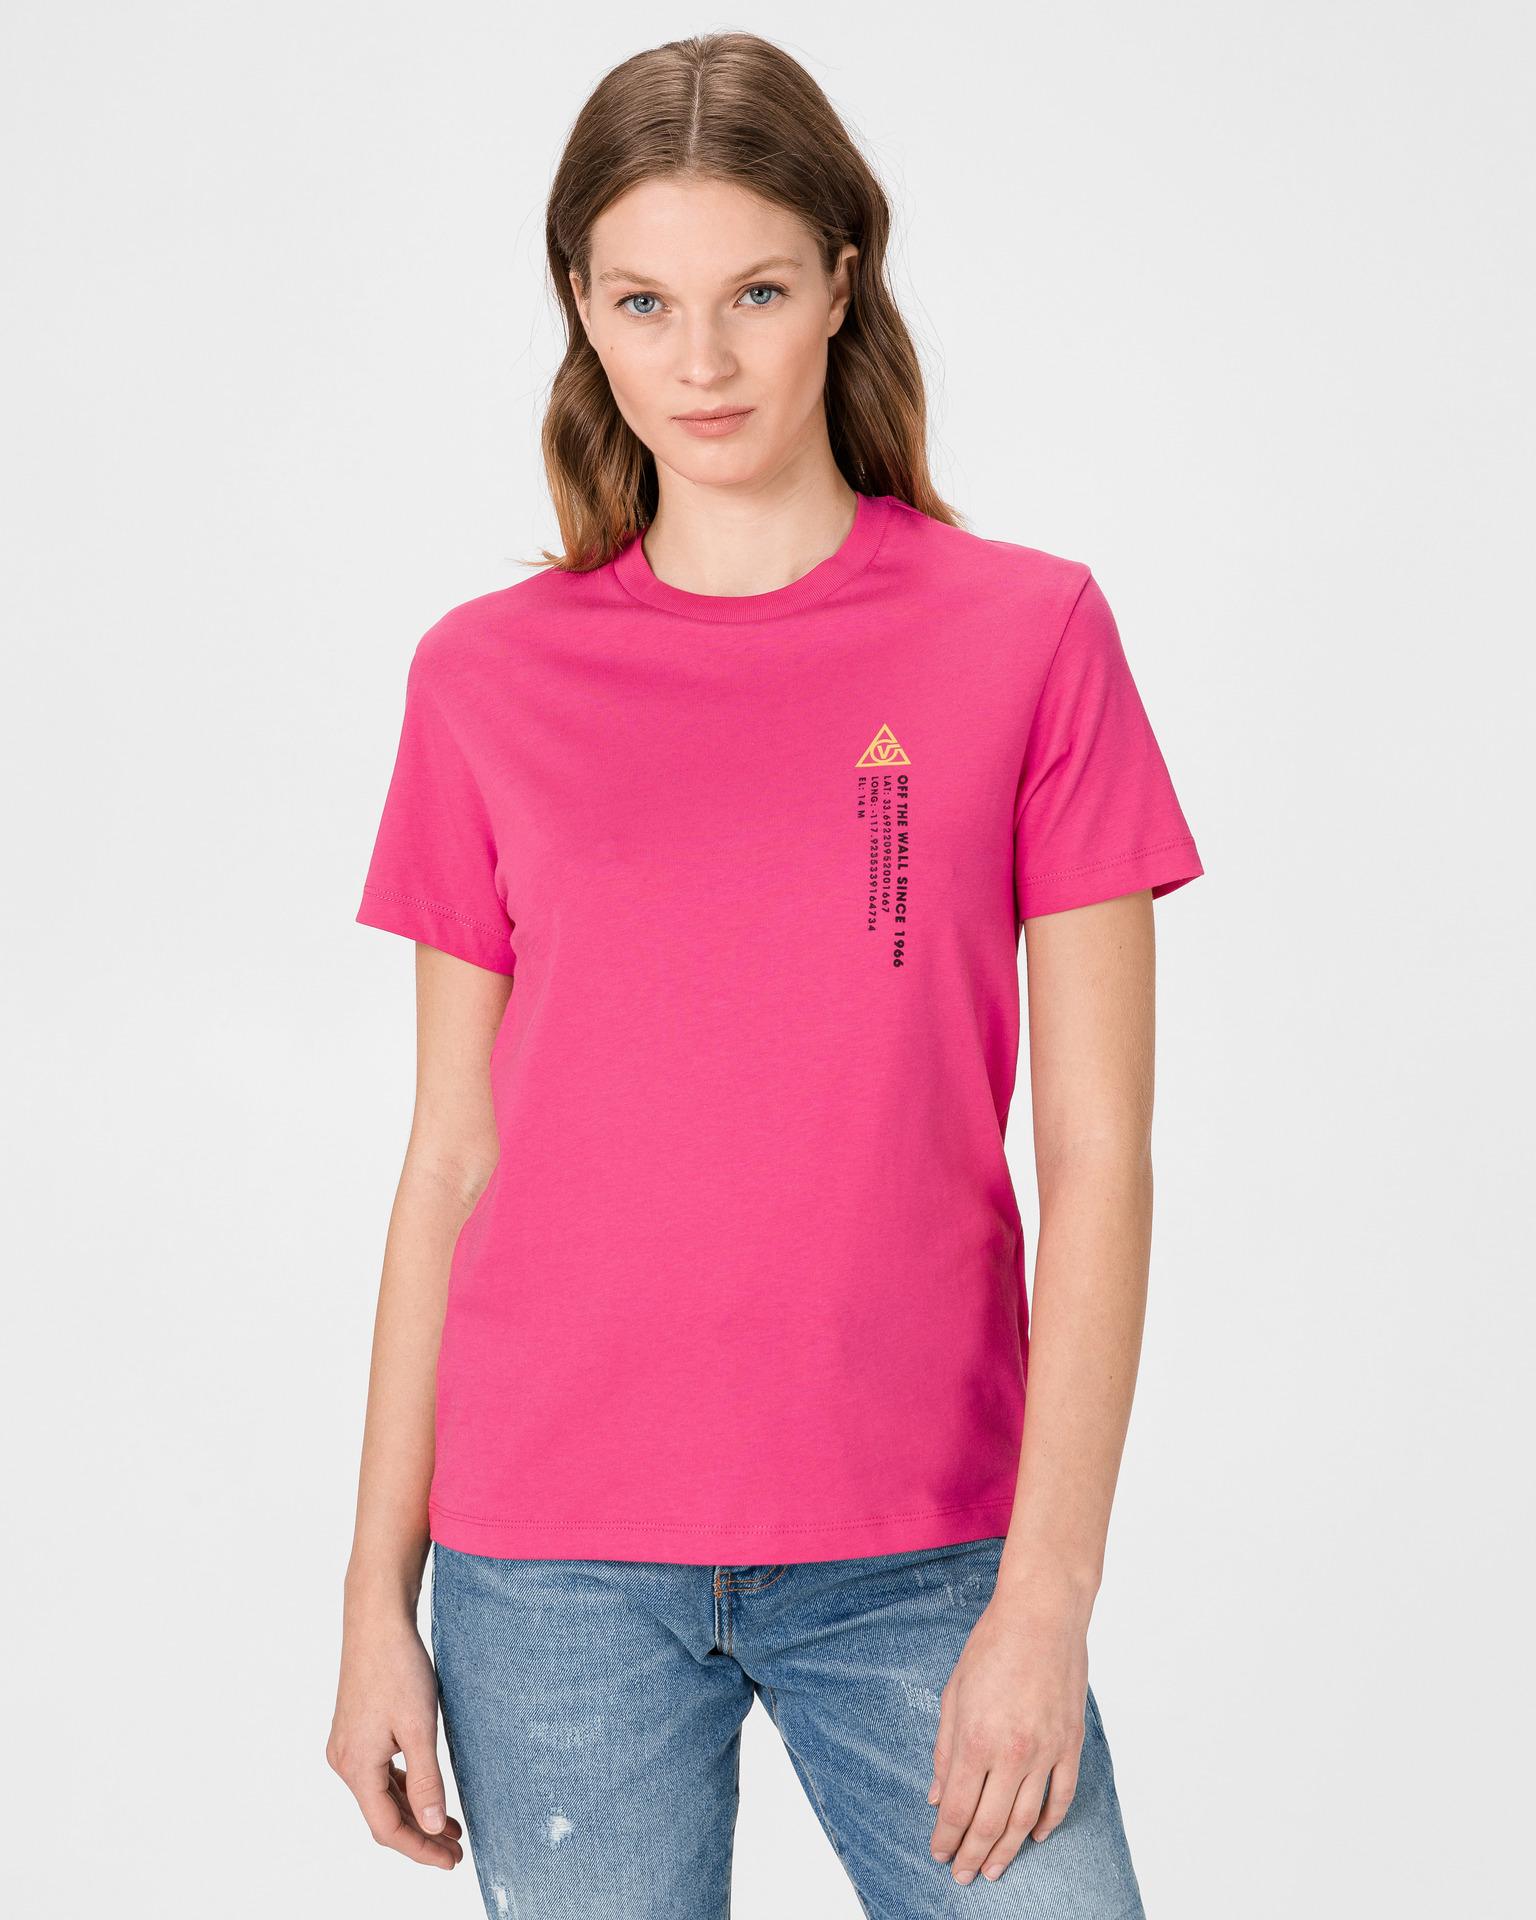 Vans różowy koszulka 66 Supply